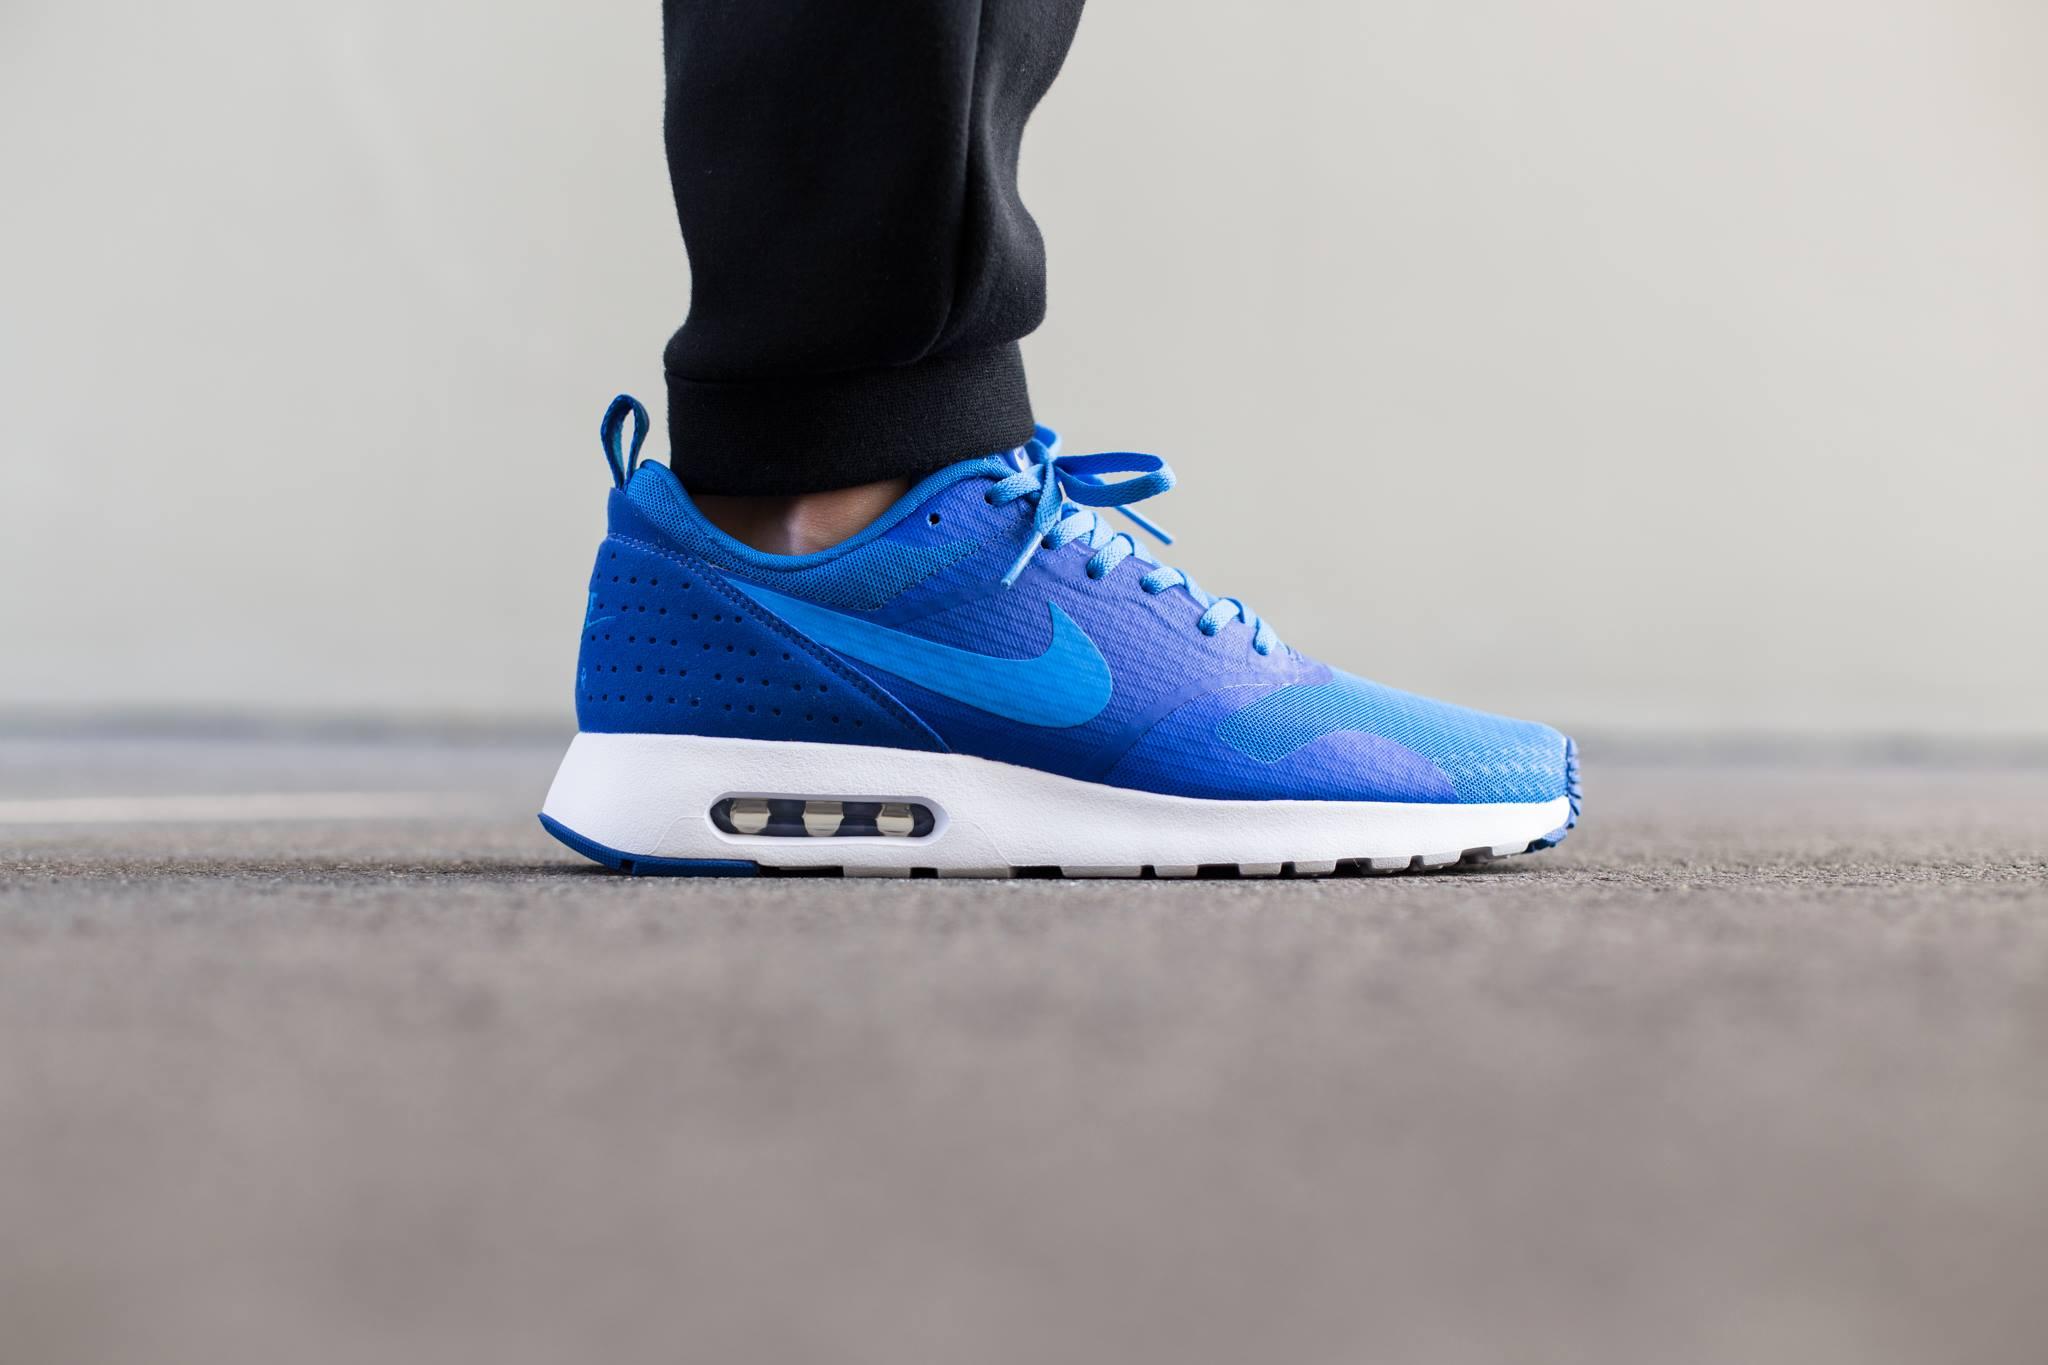 Nike Air Max Tavas Essential Photo Blue Sneakers Addict